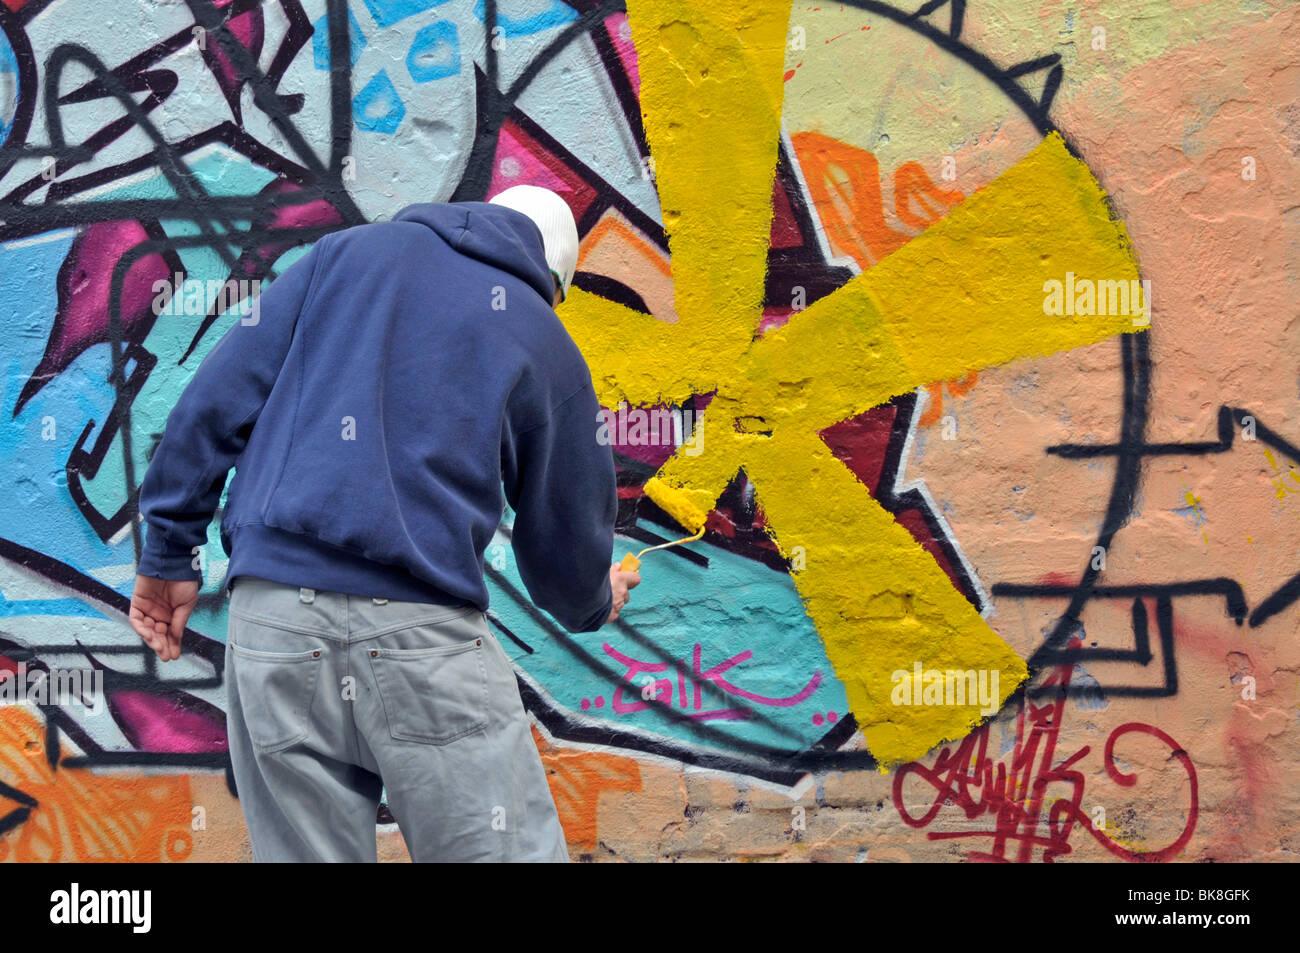 Graffiti artist working on a graffiti-covered wall, Cologne, North ...